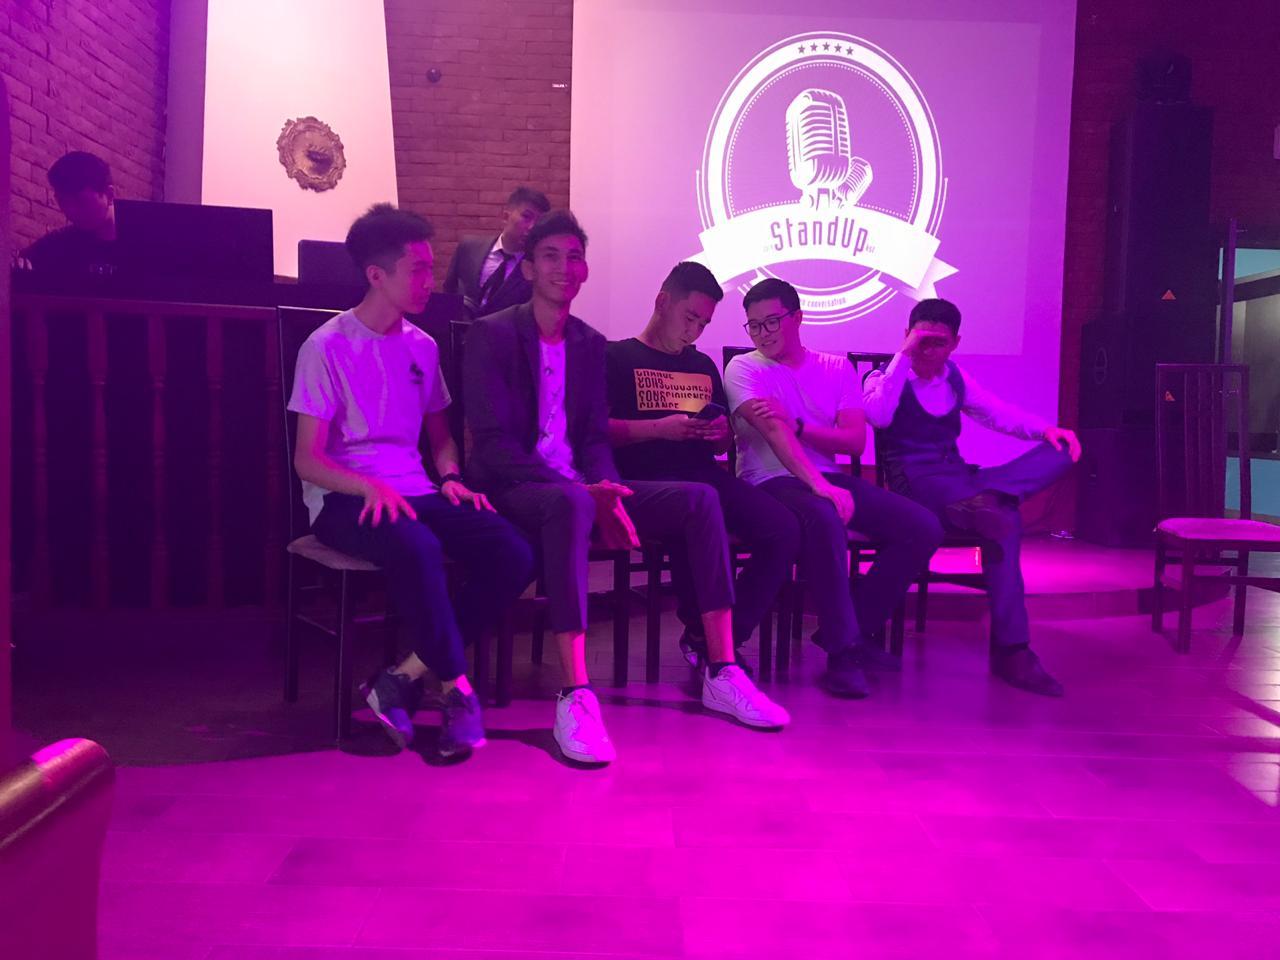 В Костанае набирает популярность формат STAND-UP Comedy